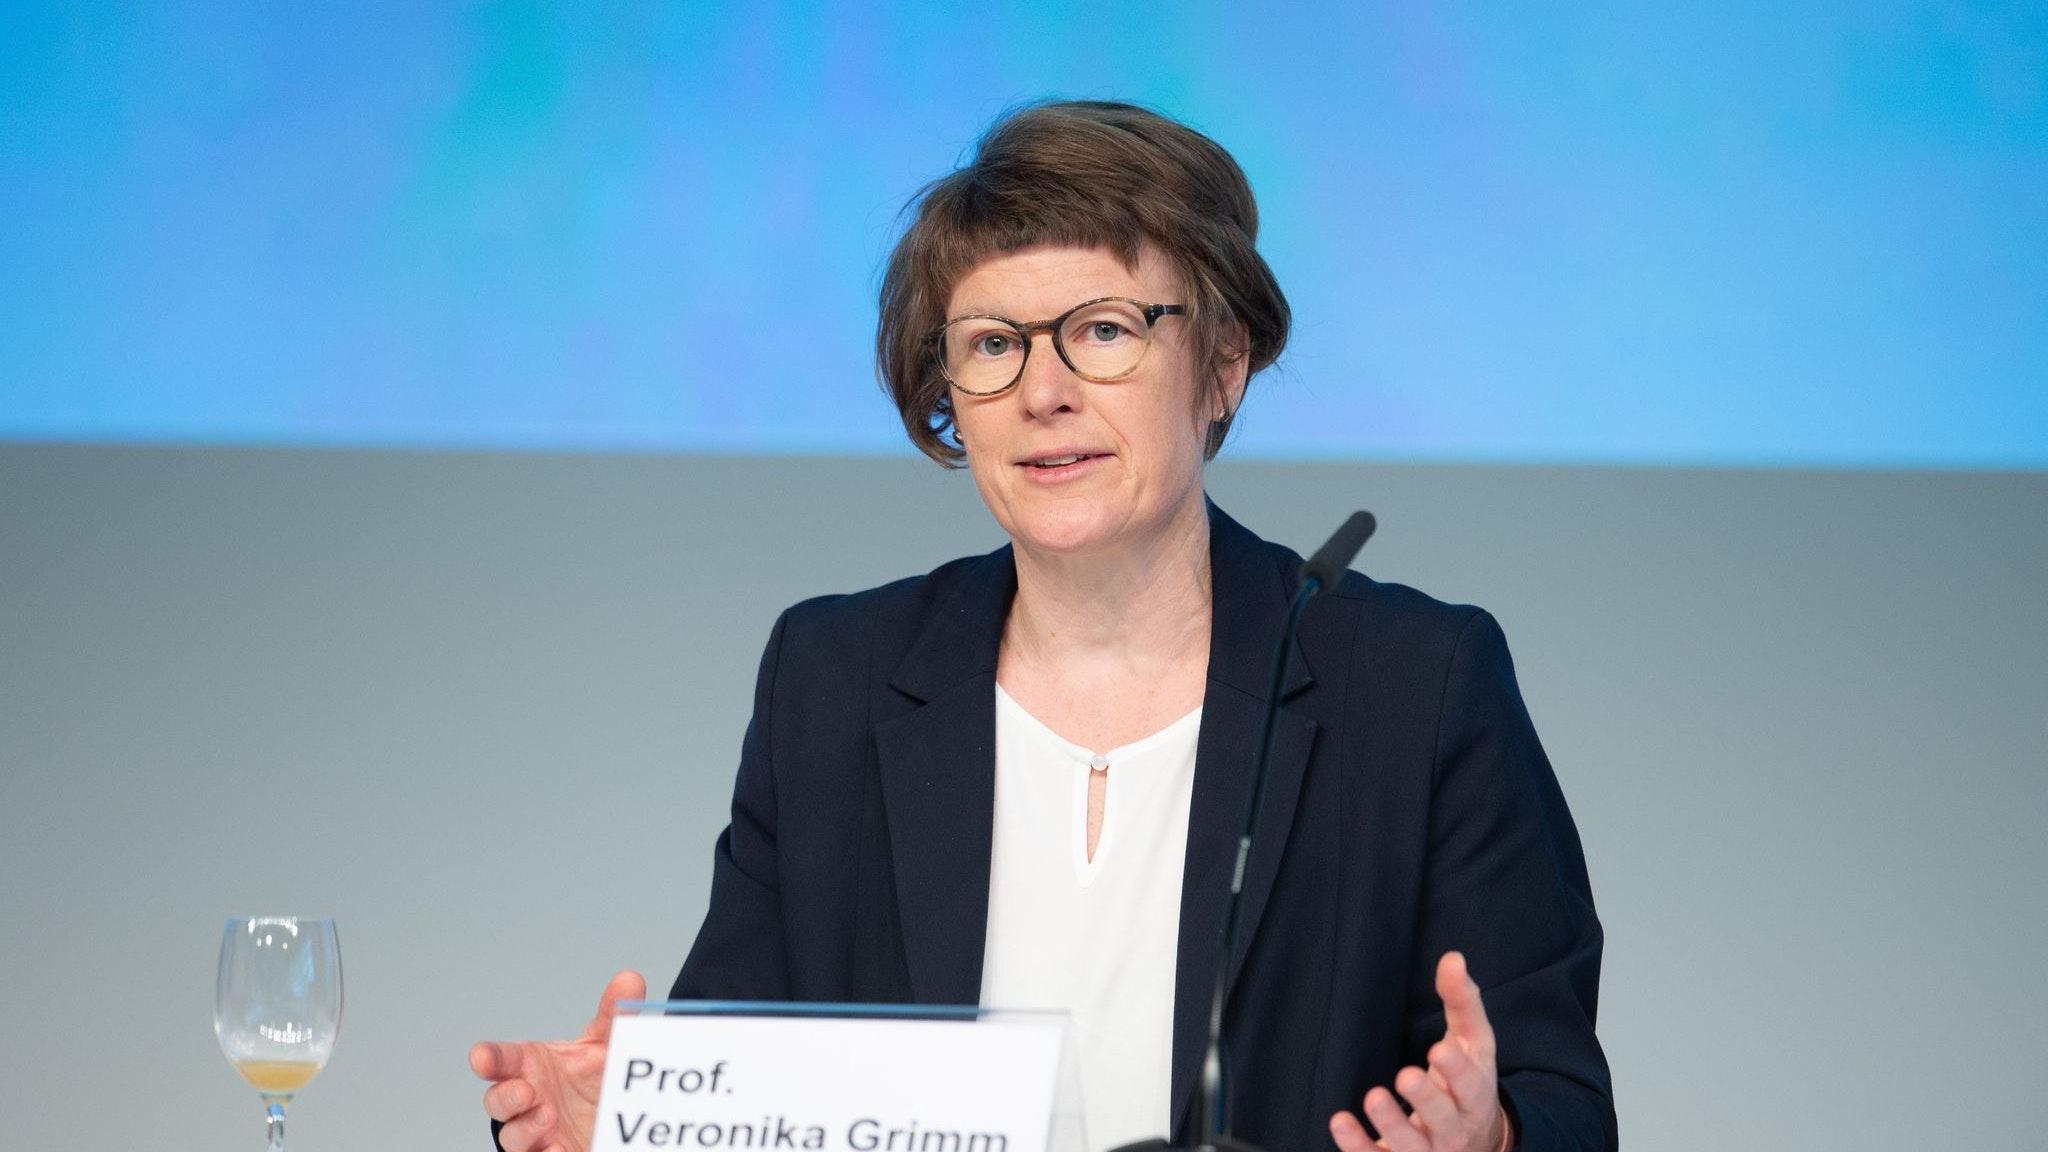 Professorin Veronika Grimm. Foto: dpa/Schamberger